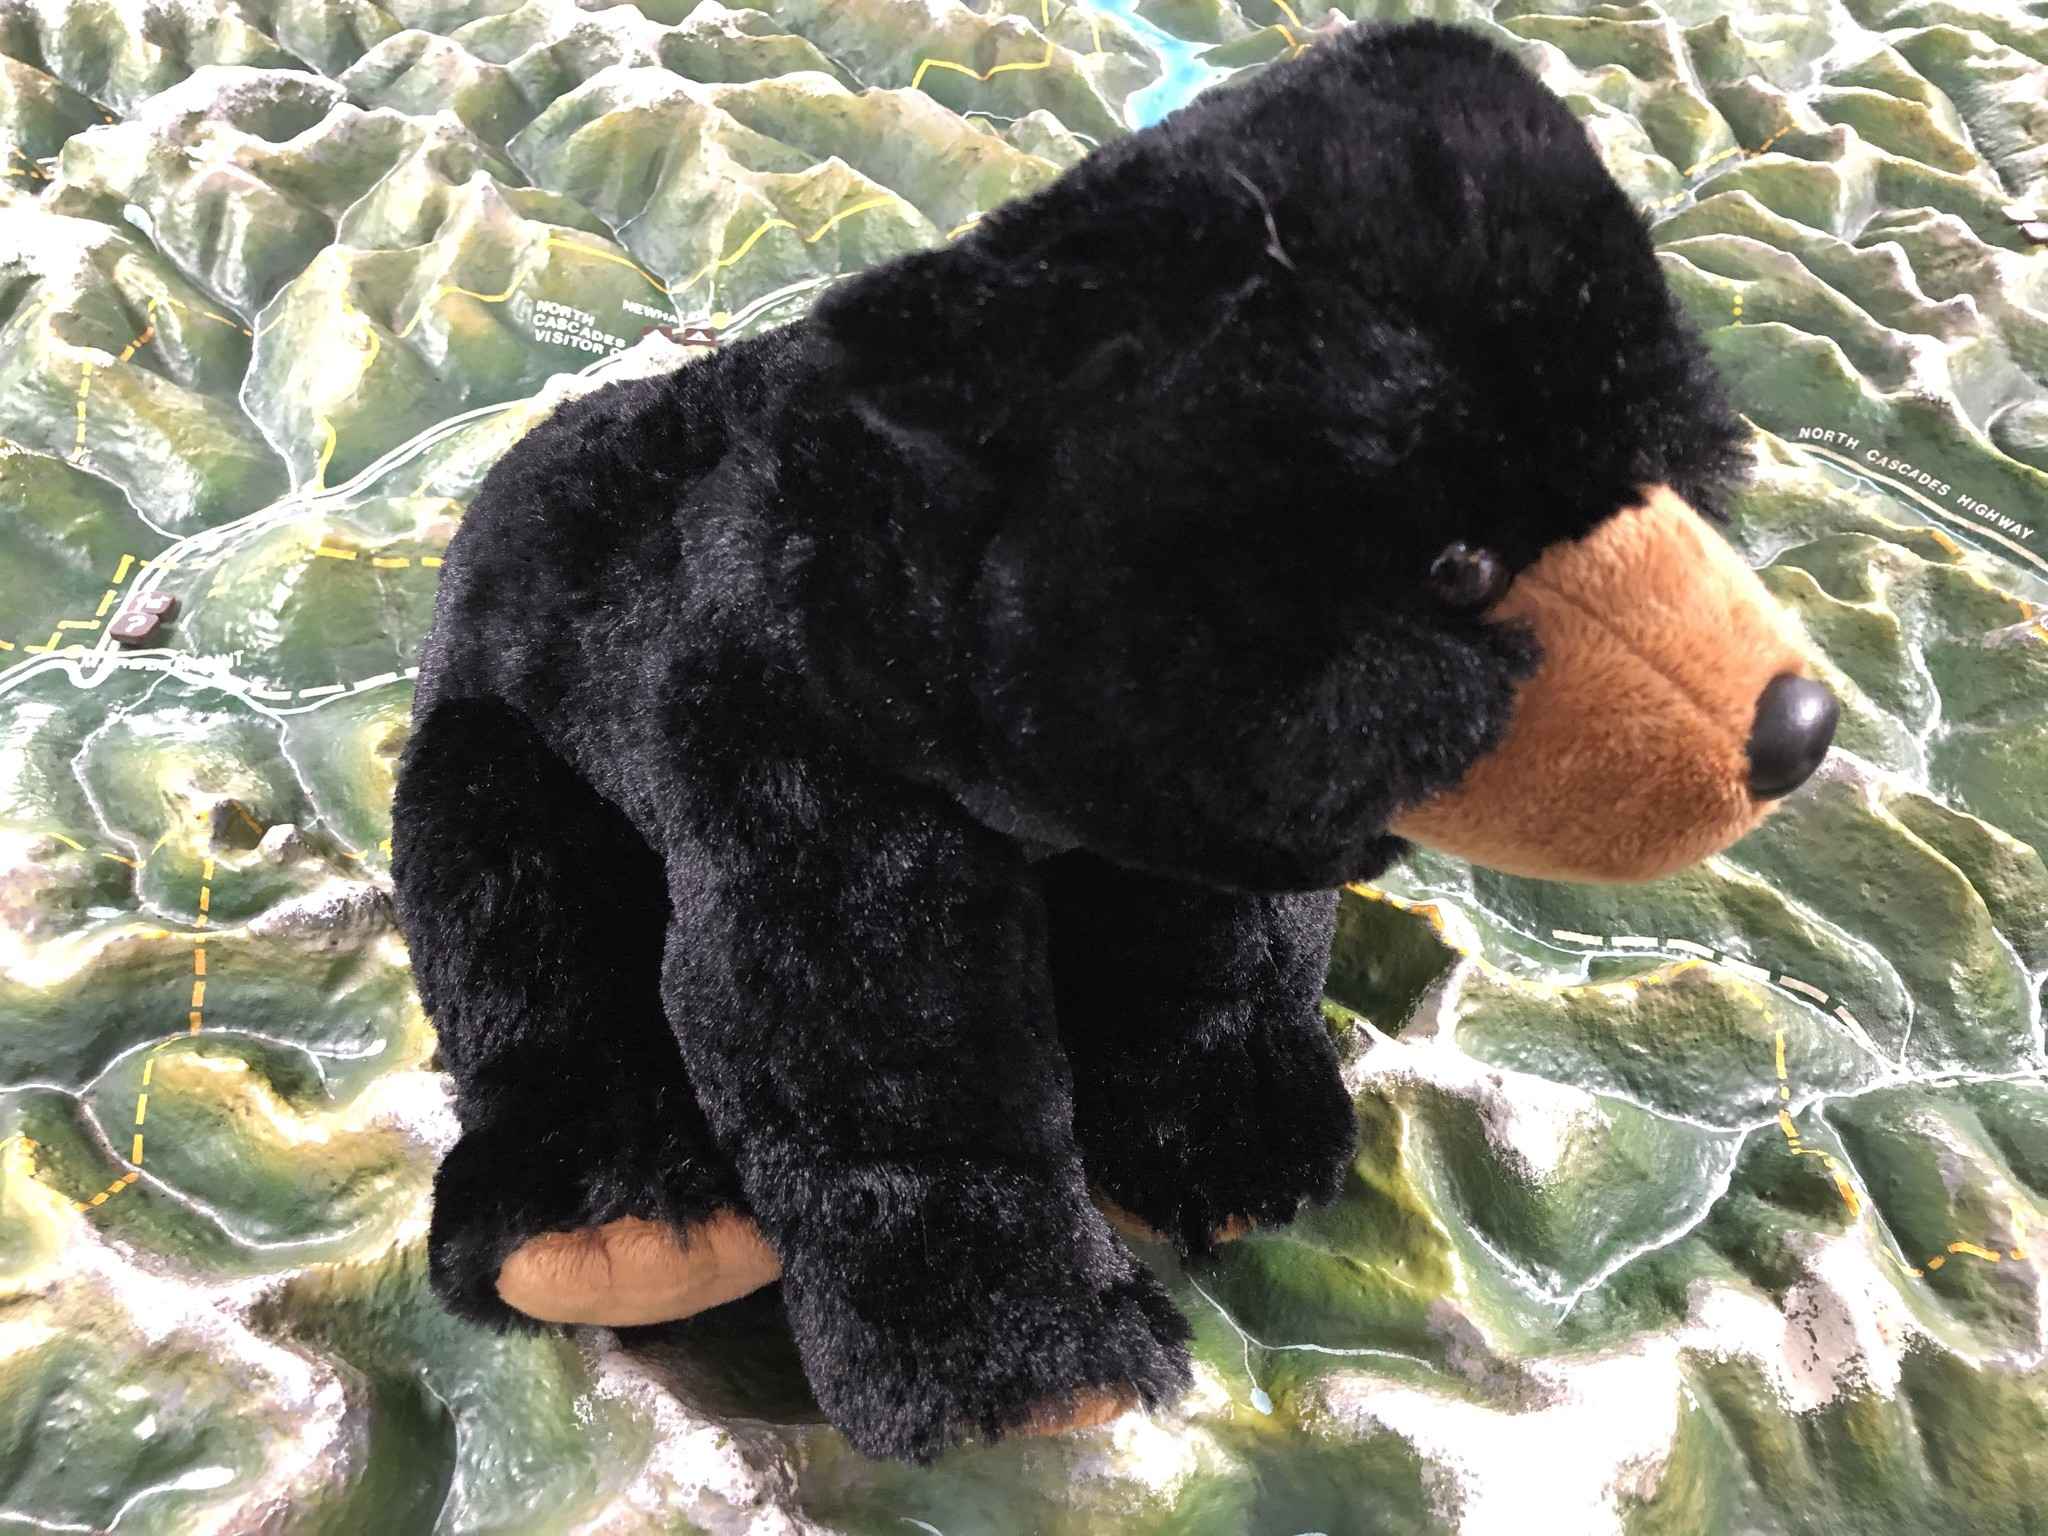 Stuffed animal bear